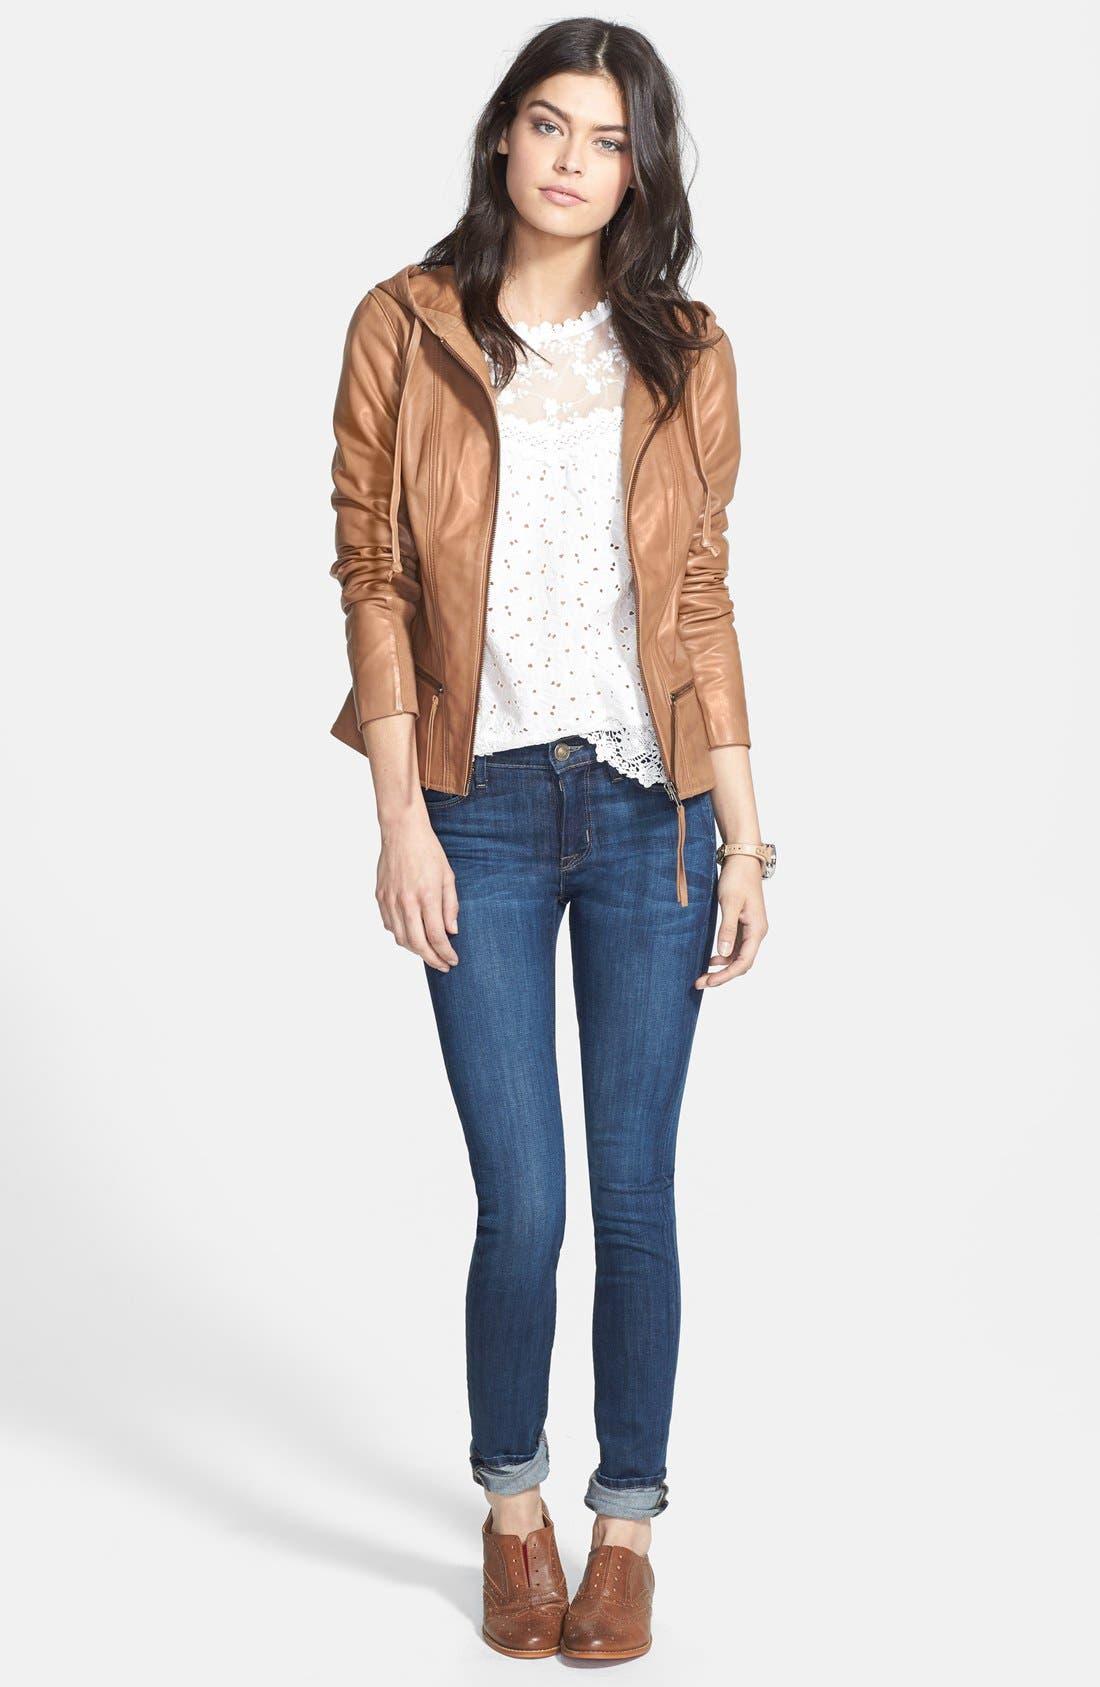 HUDSON JEANS, 'Collette' Skinny Jeans, Alternate thumbnail 2, color, 400